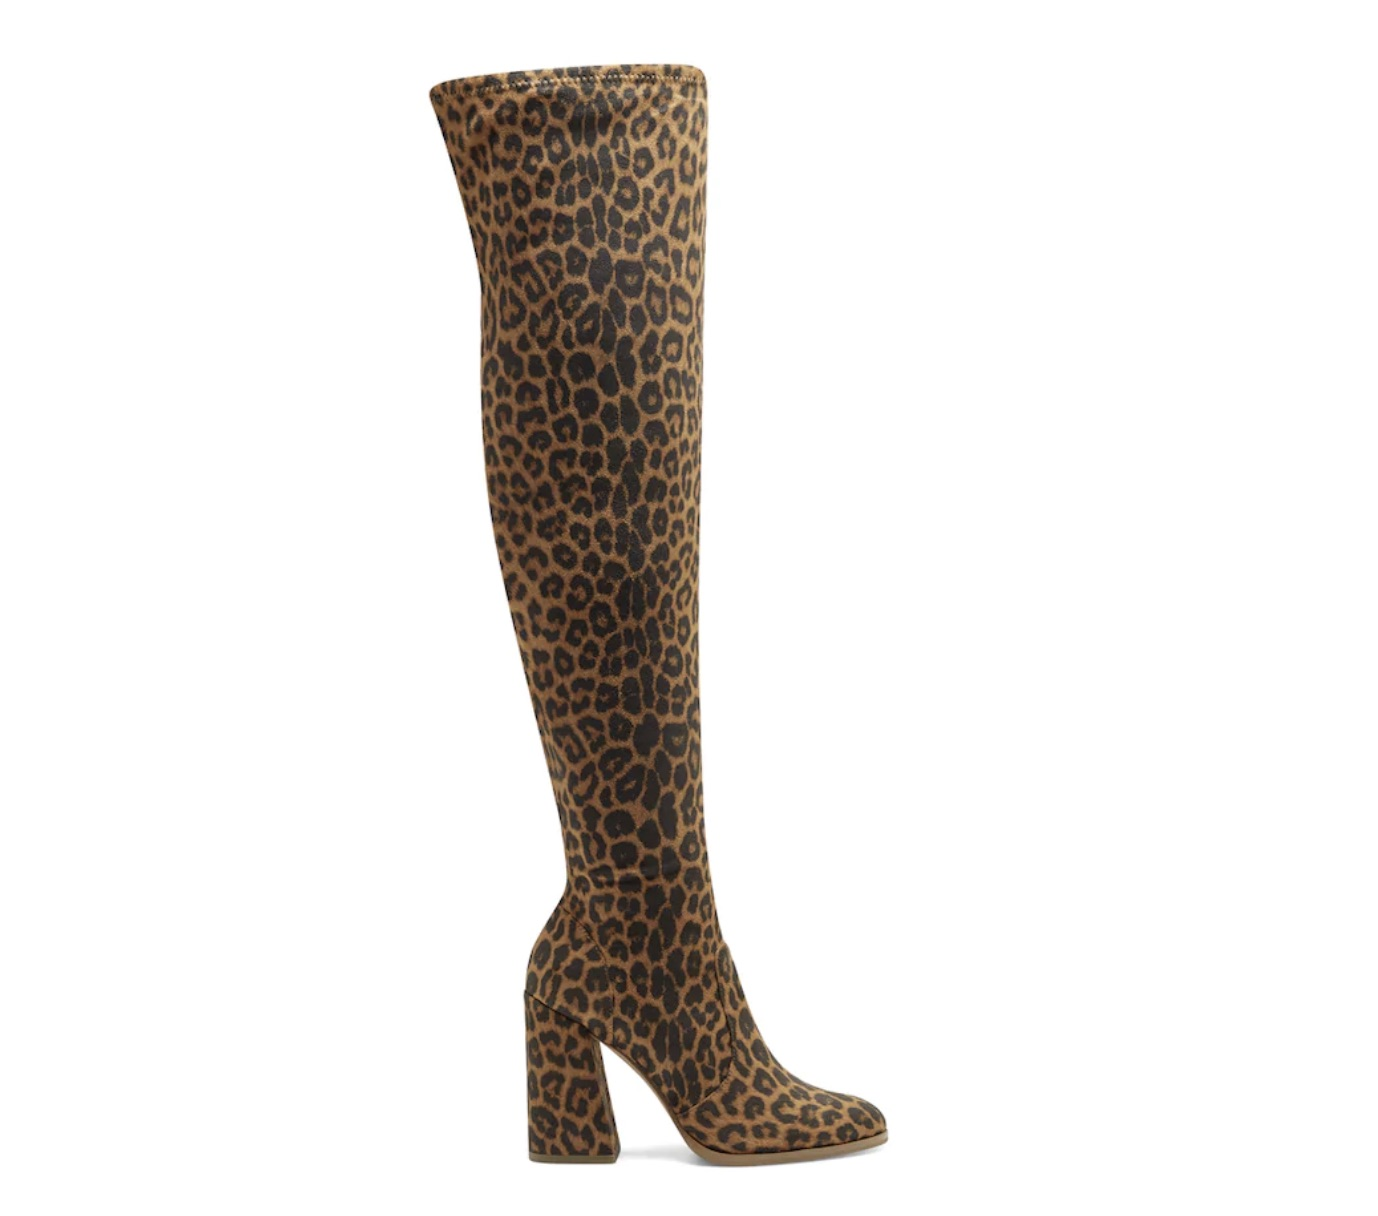 Jessica Simpson Leopard Print Boots